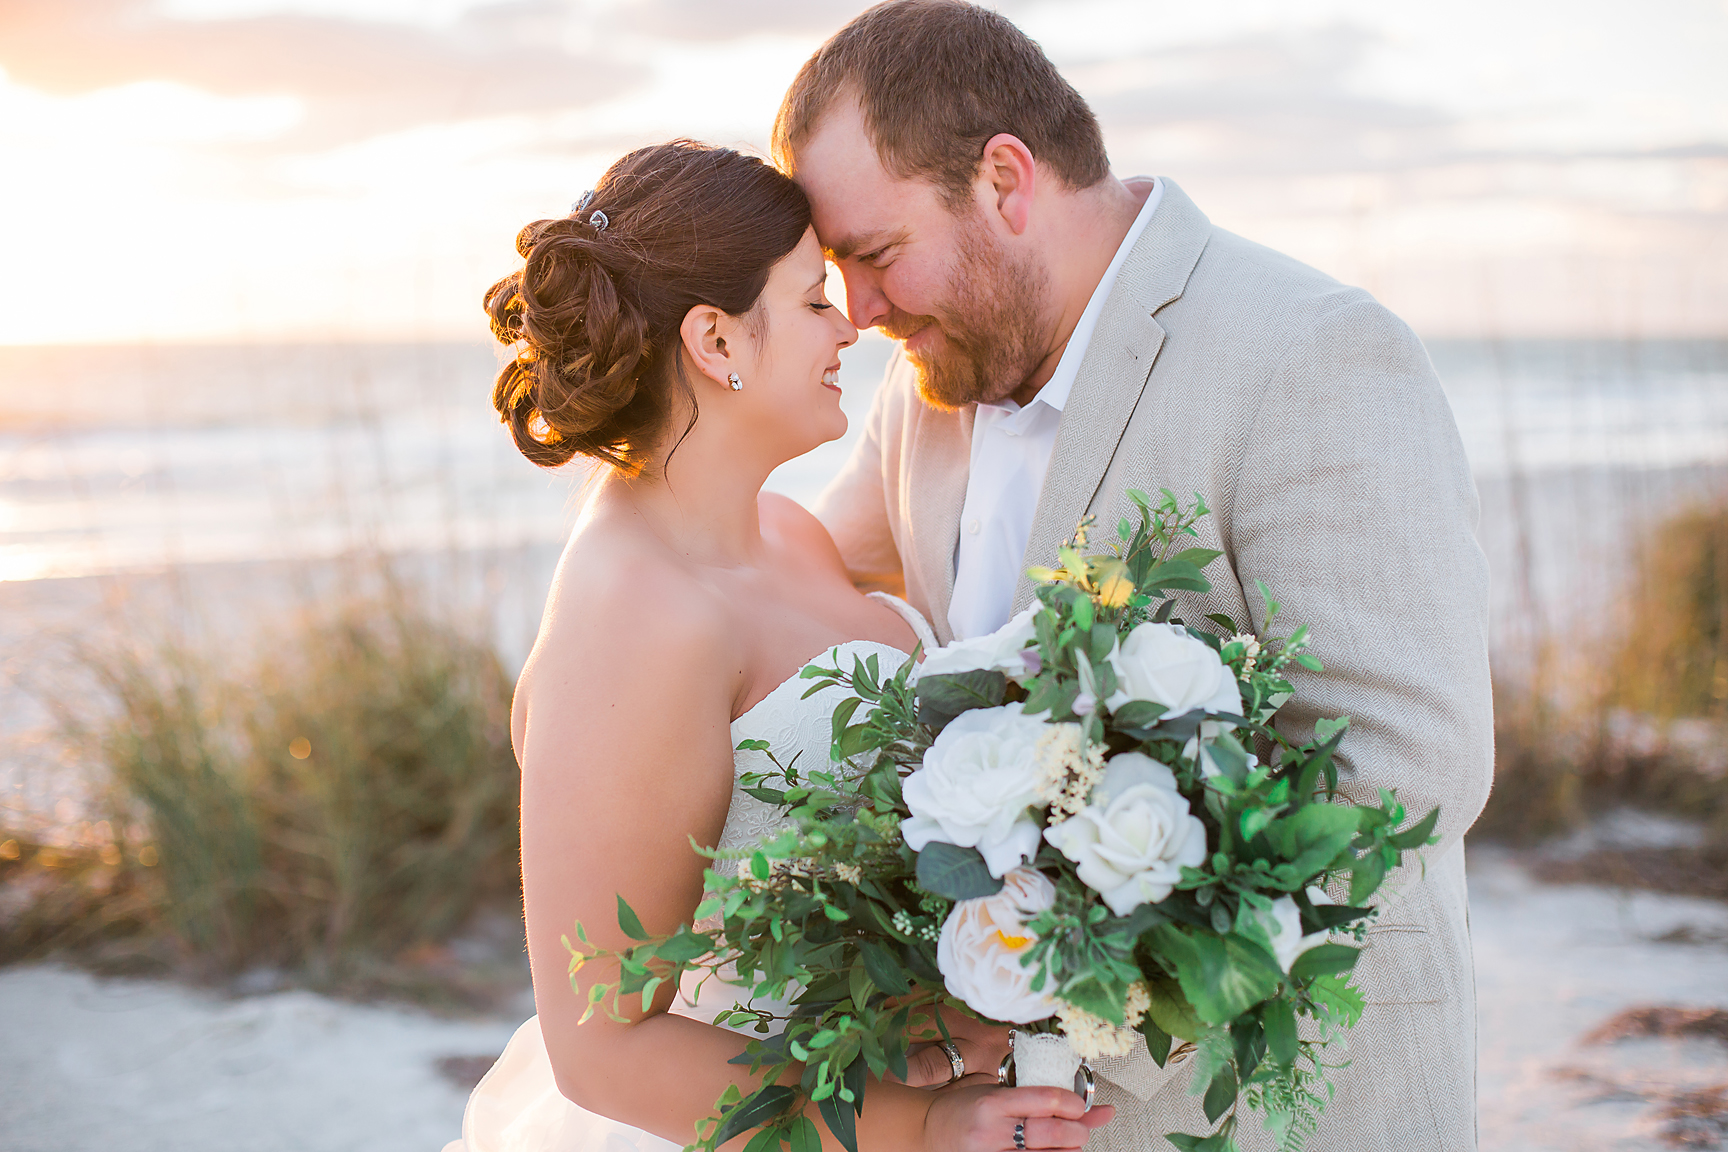 Bailey + Chalin - Anna Maria Island Wedding Photographer - Destination Wedding Photography - Emily & Co. Photography - Beach Wedding Photography 89.jpg